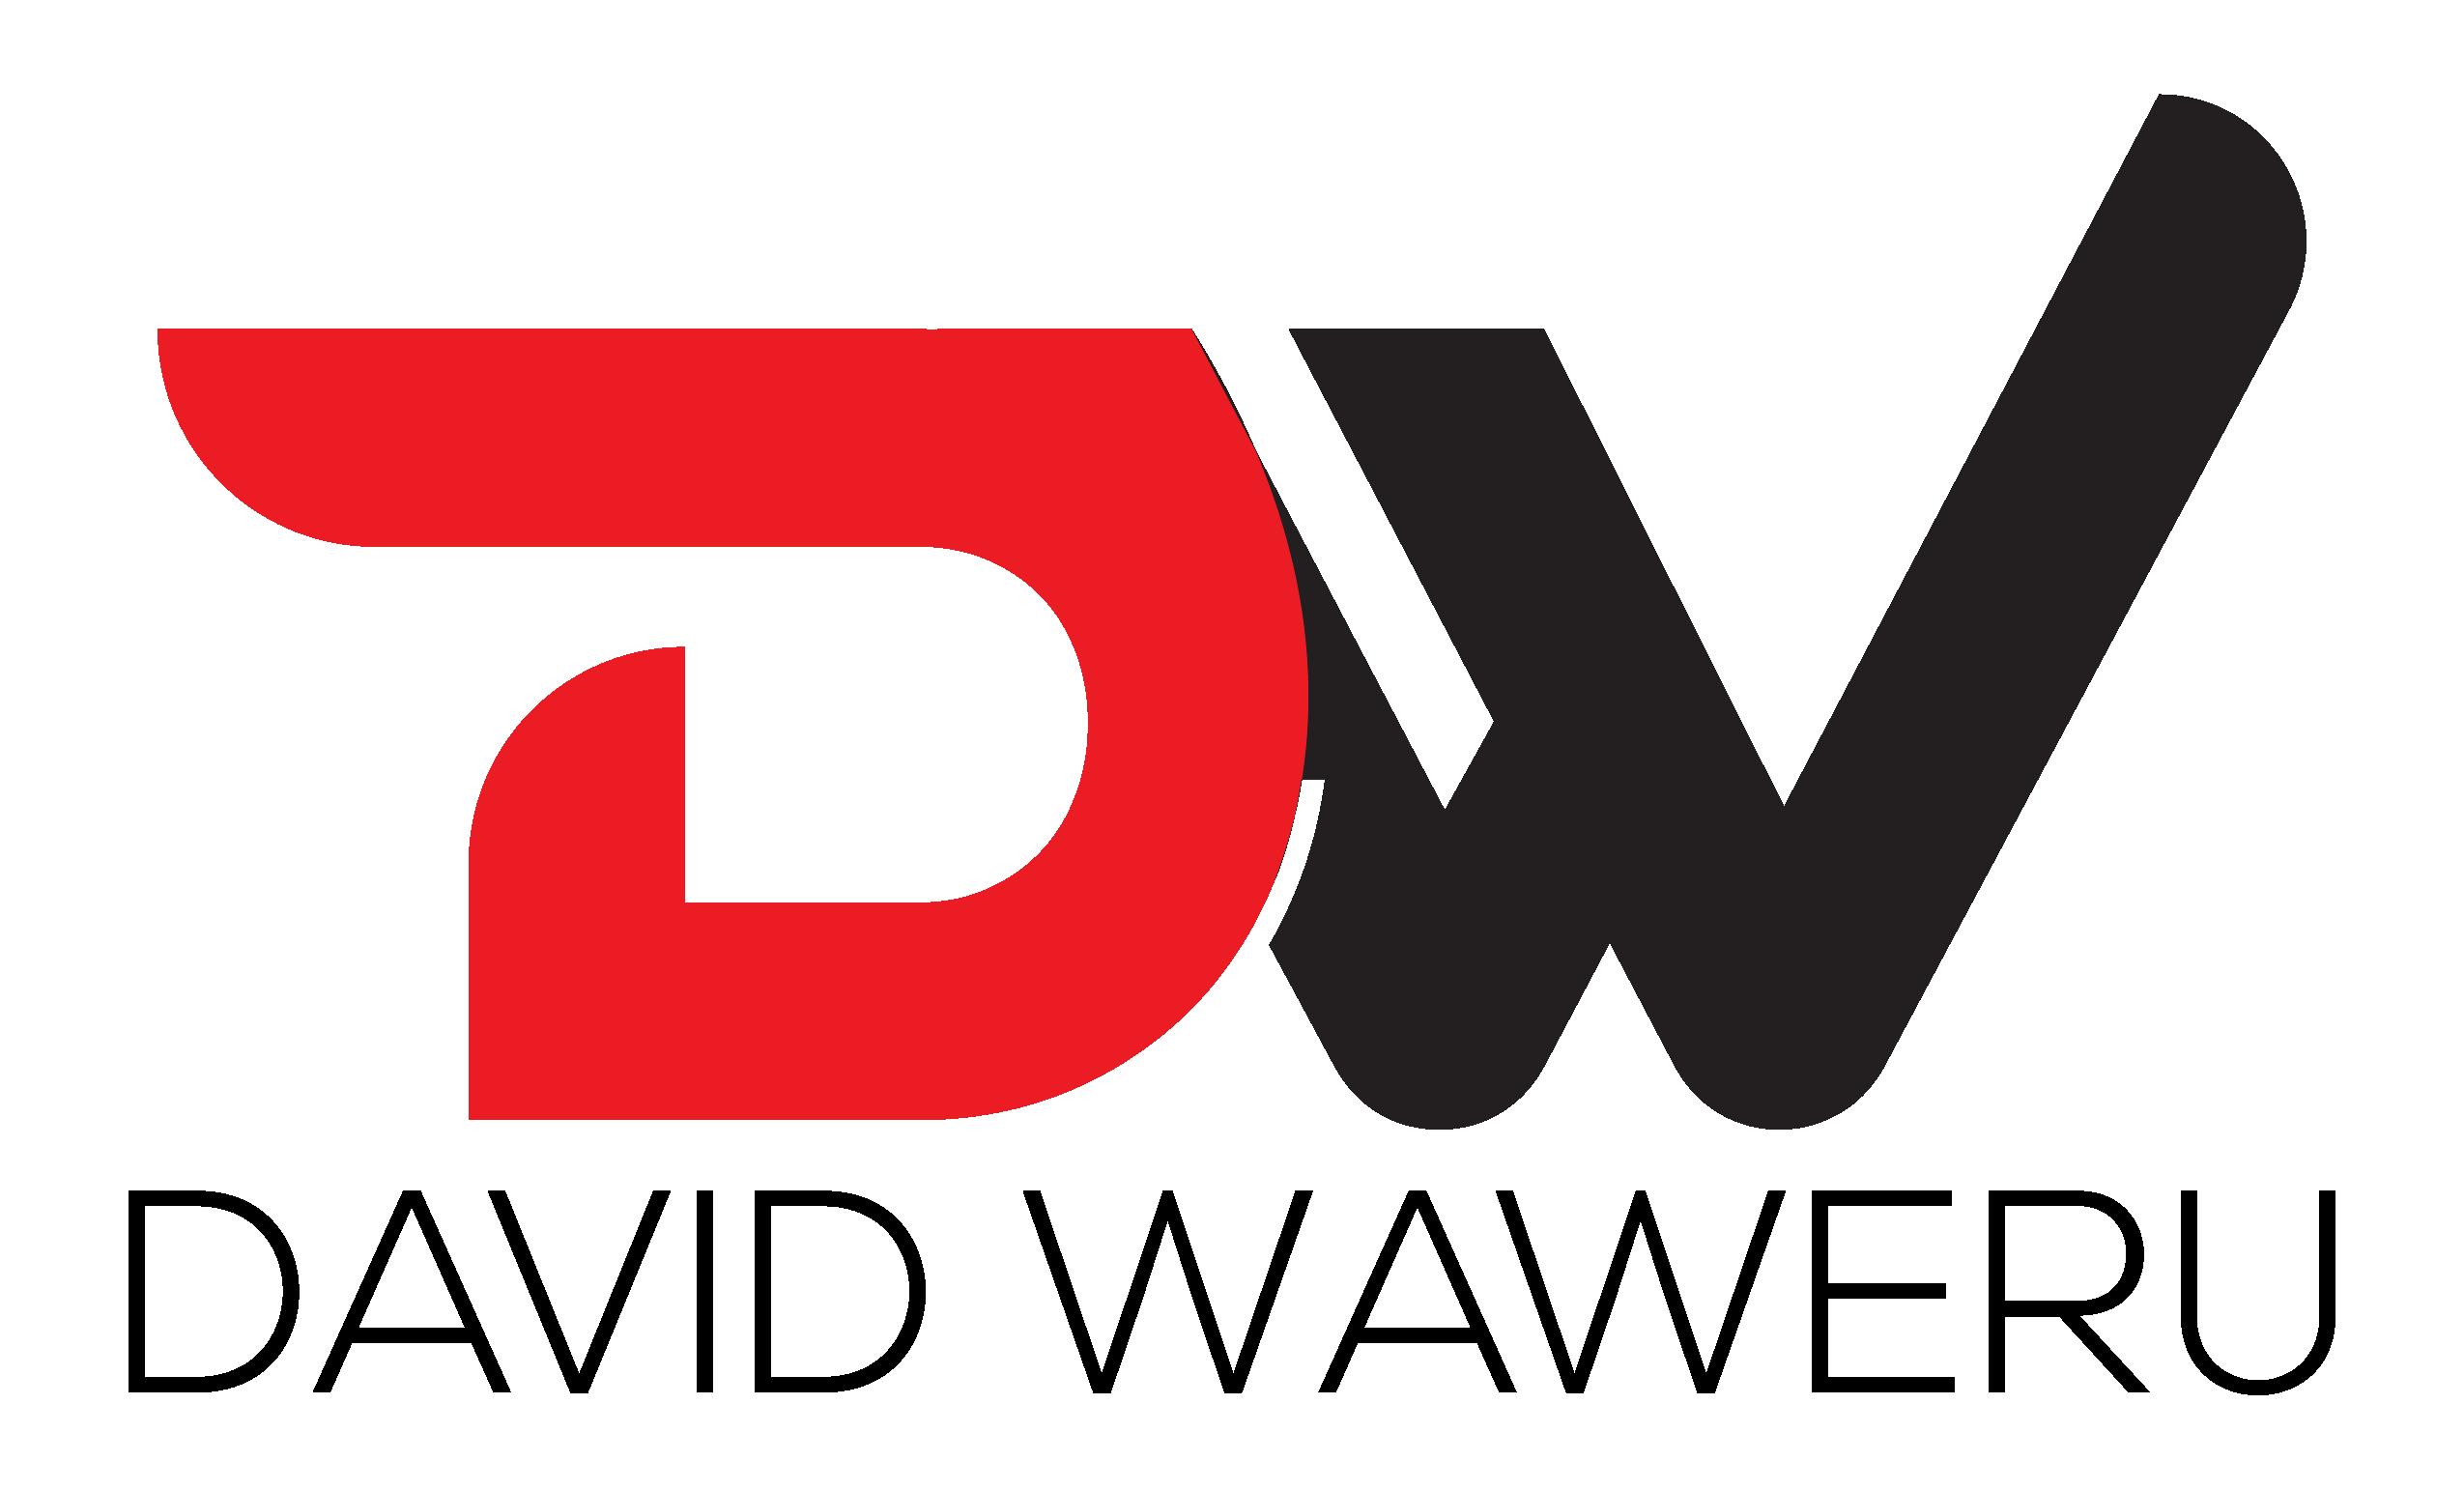 David Waweru